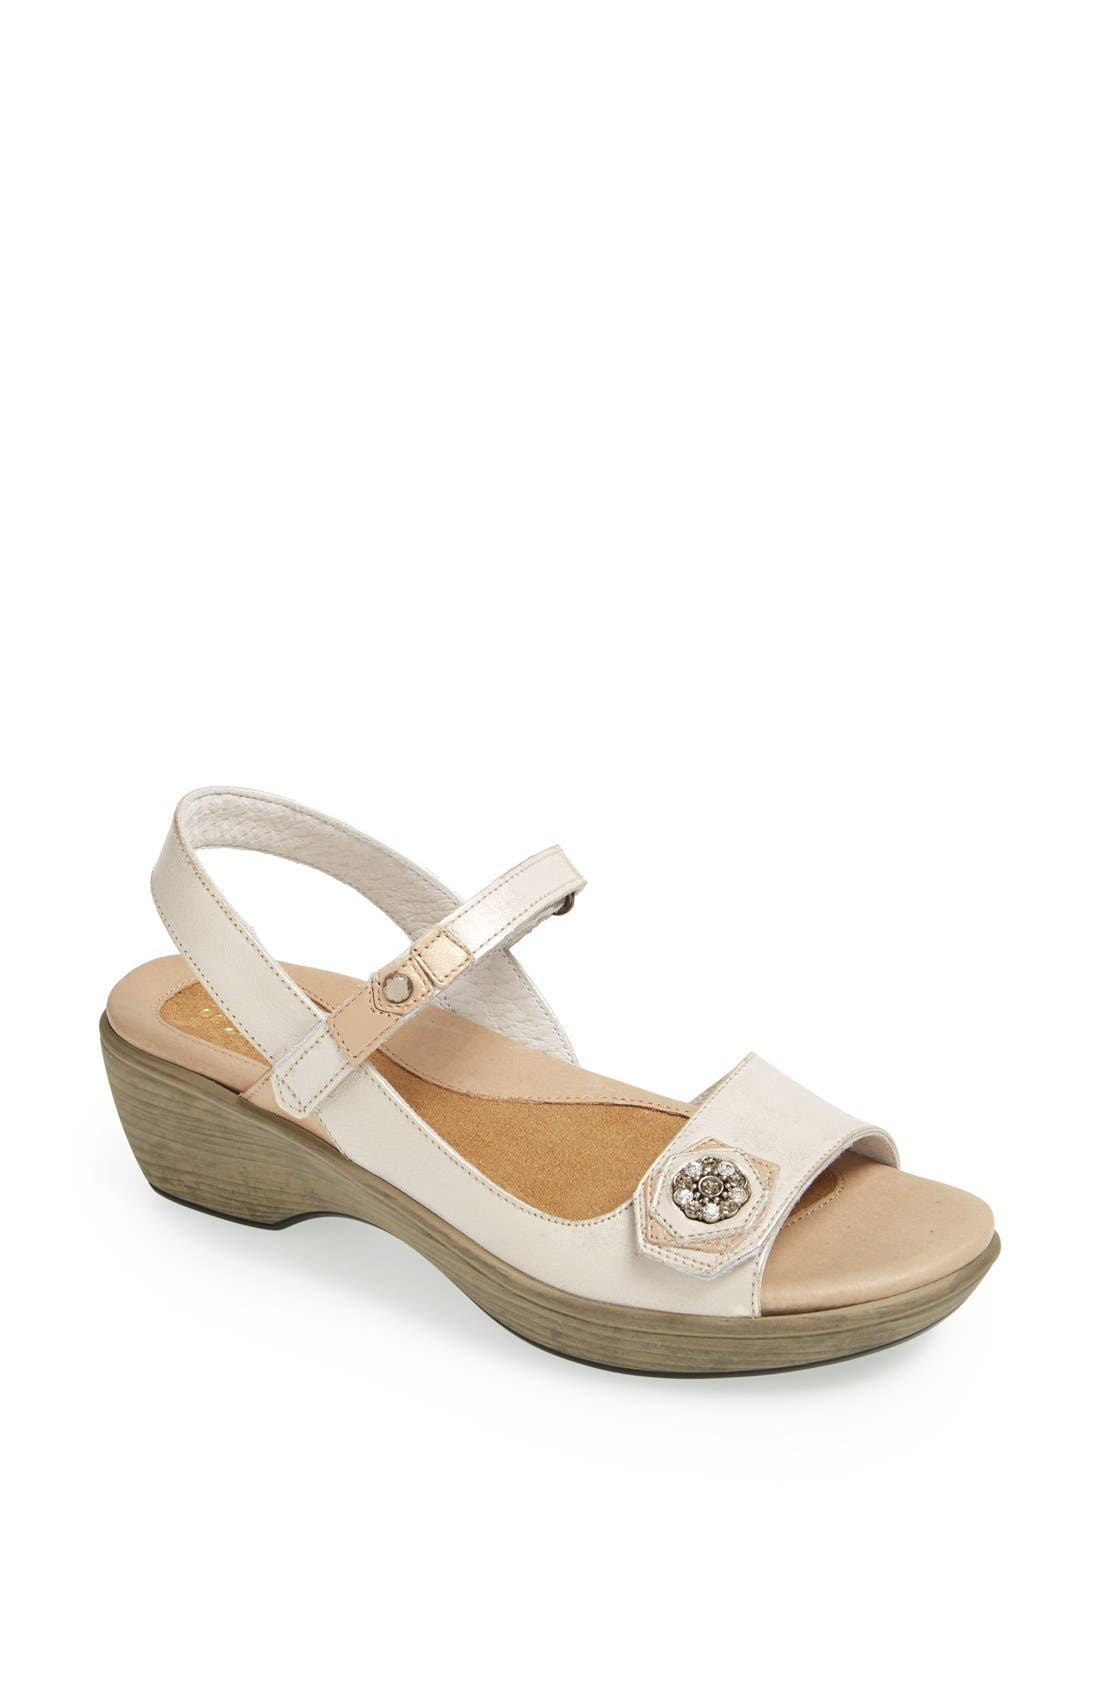 Alternate Image 1 Selected - Naot 'Reserve' Sandal